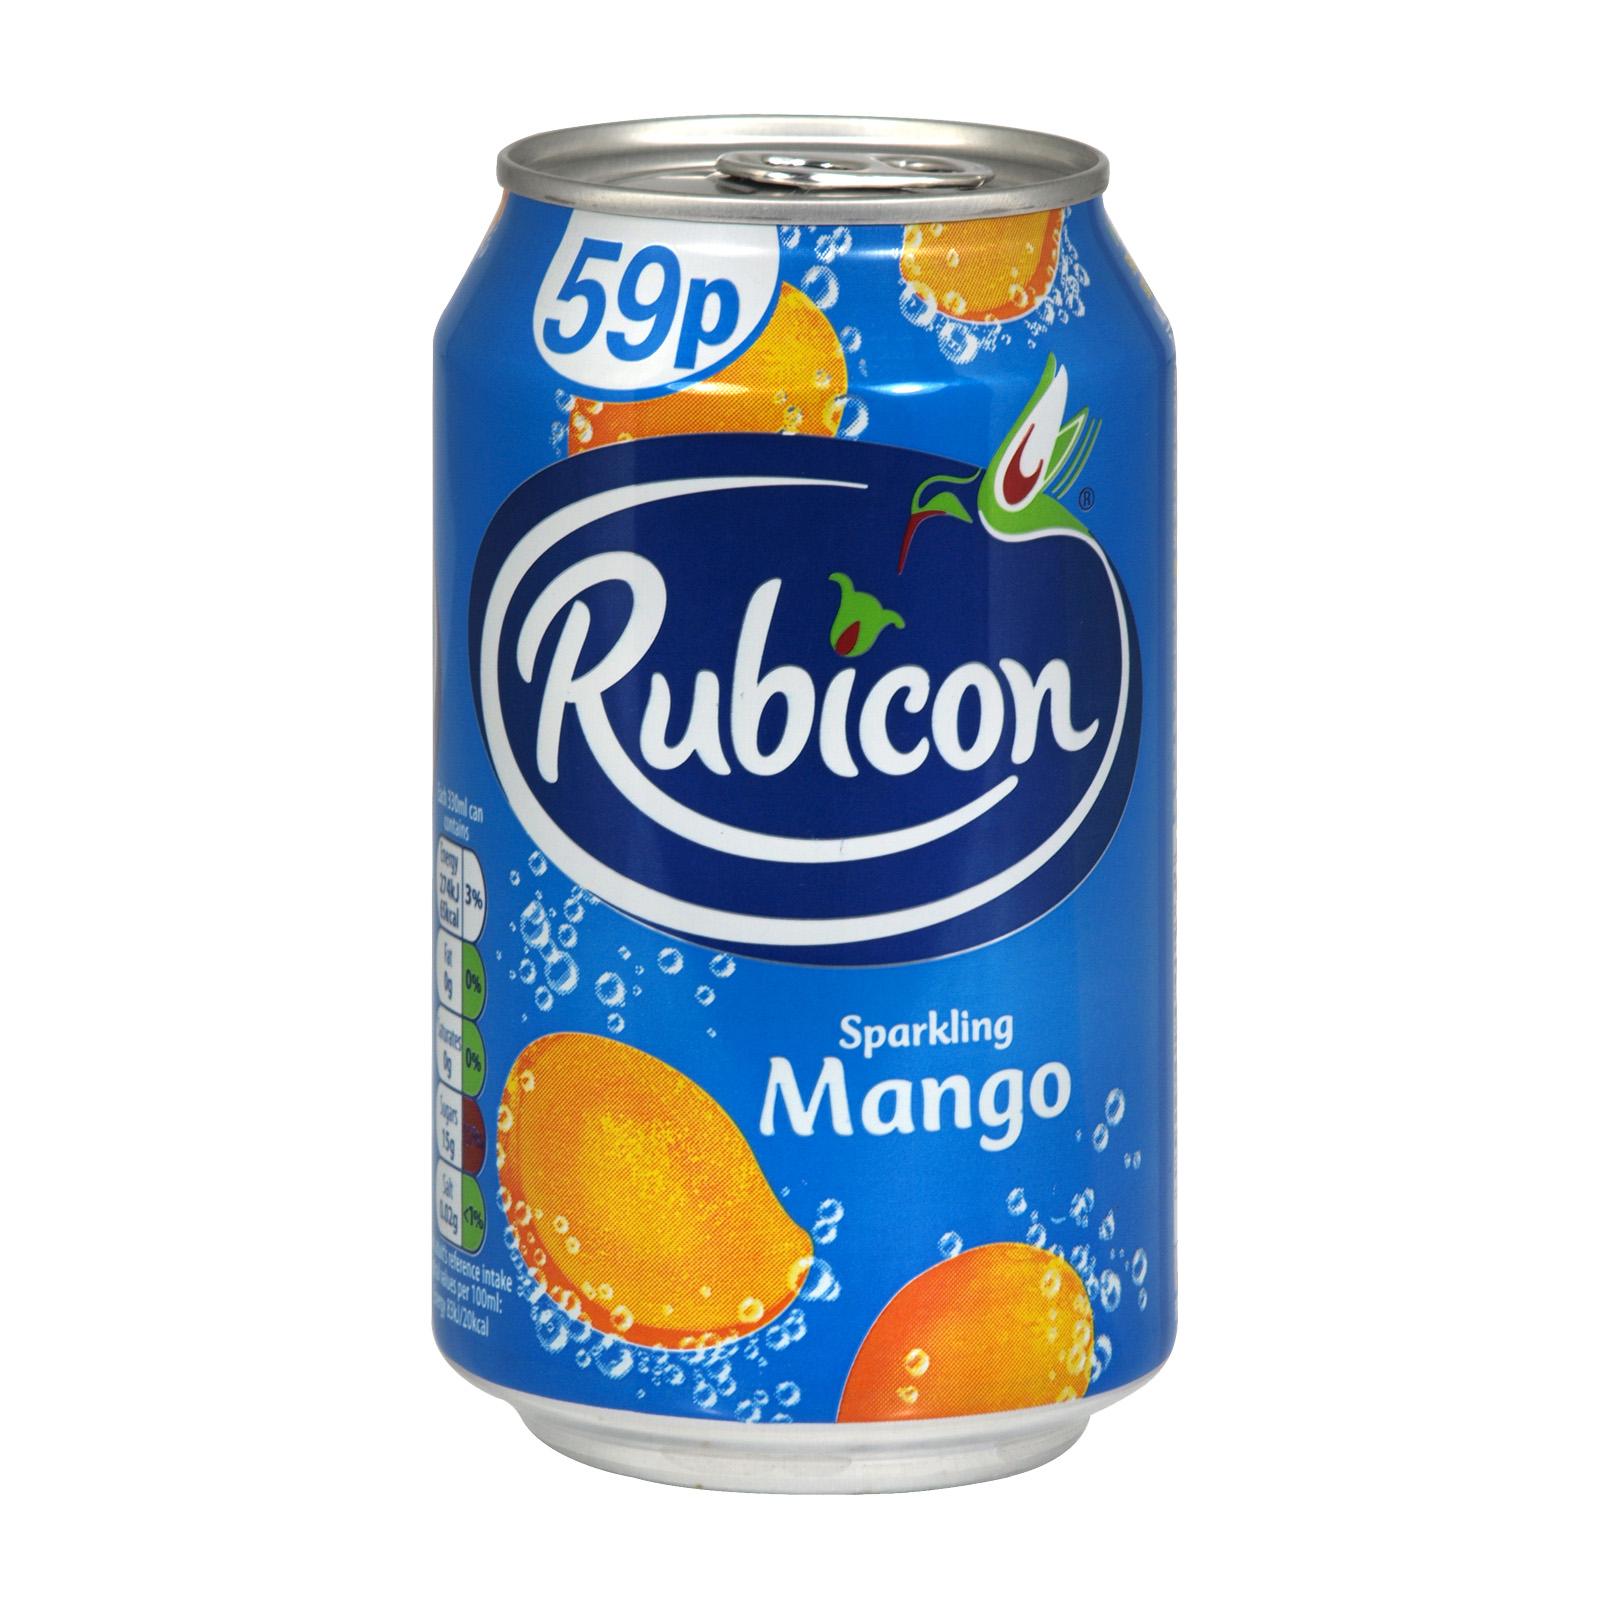 RUBICON CANS PM 59P MANGO